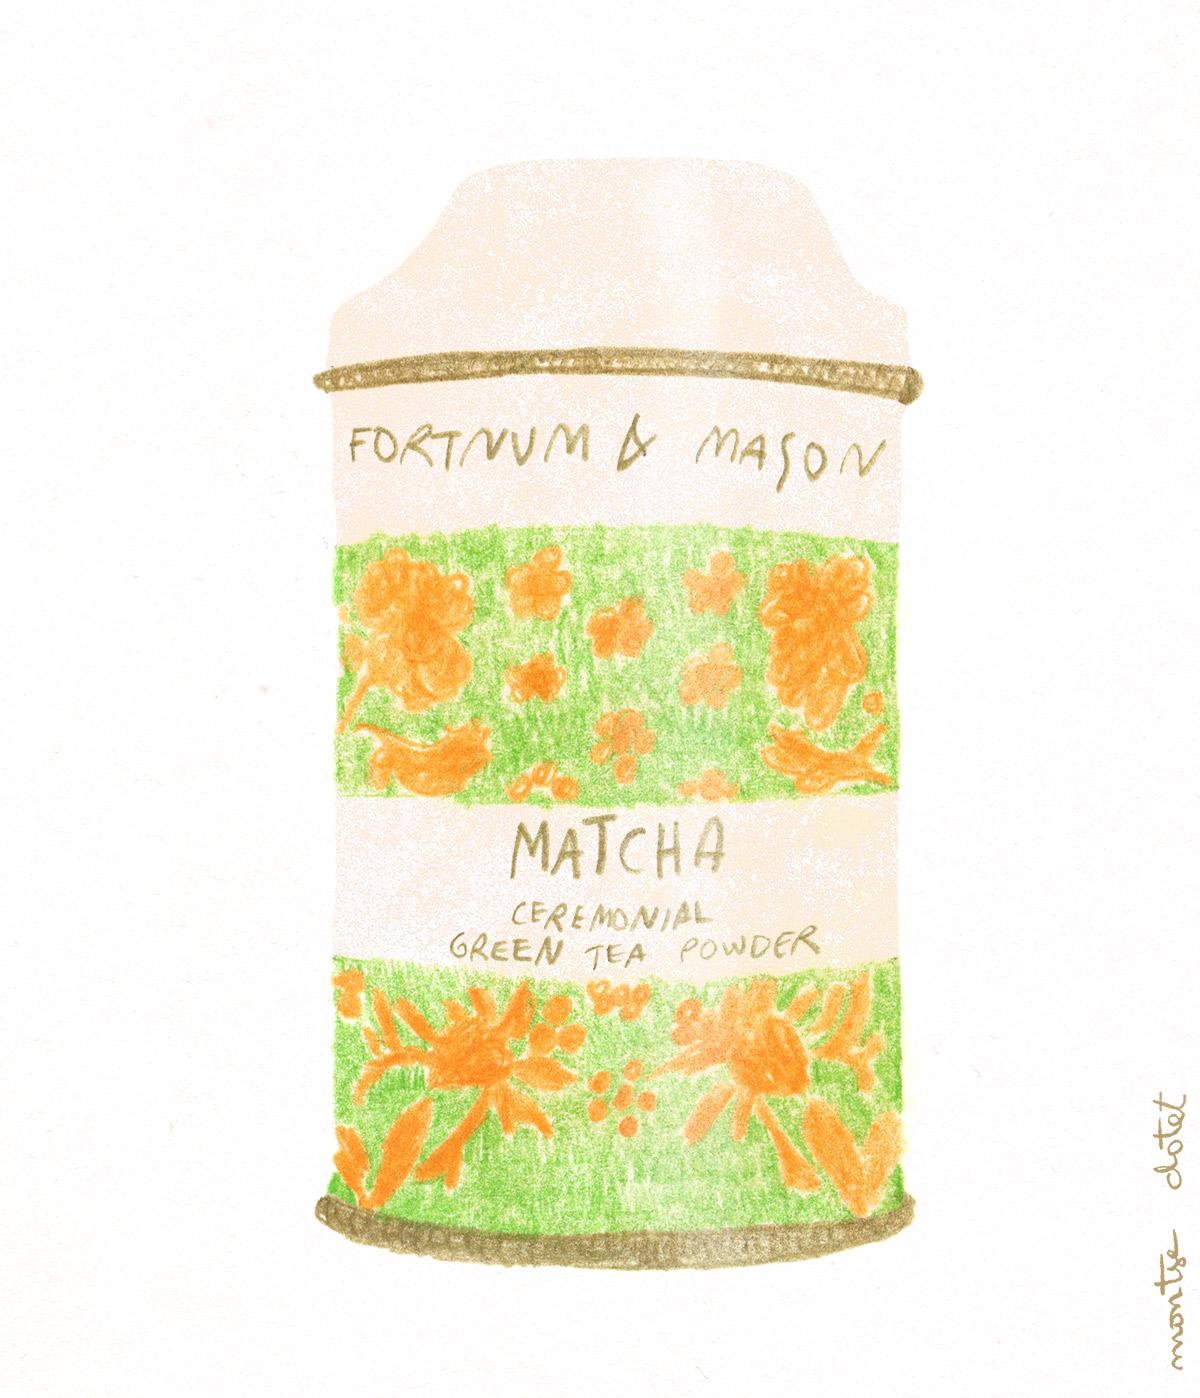 matchatea2_mclotet.jpg